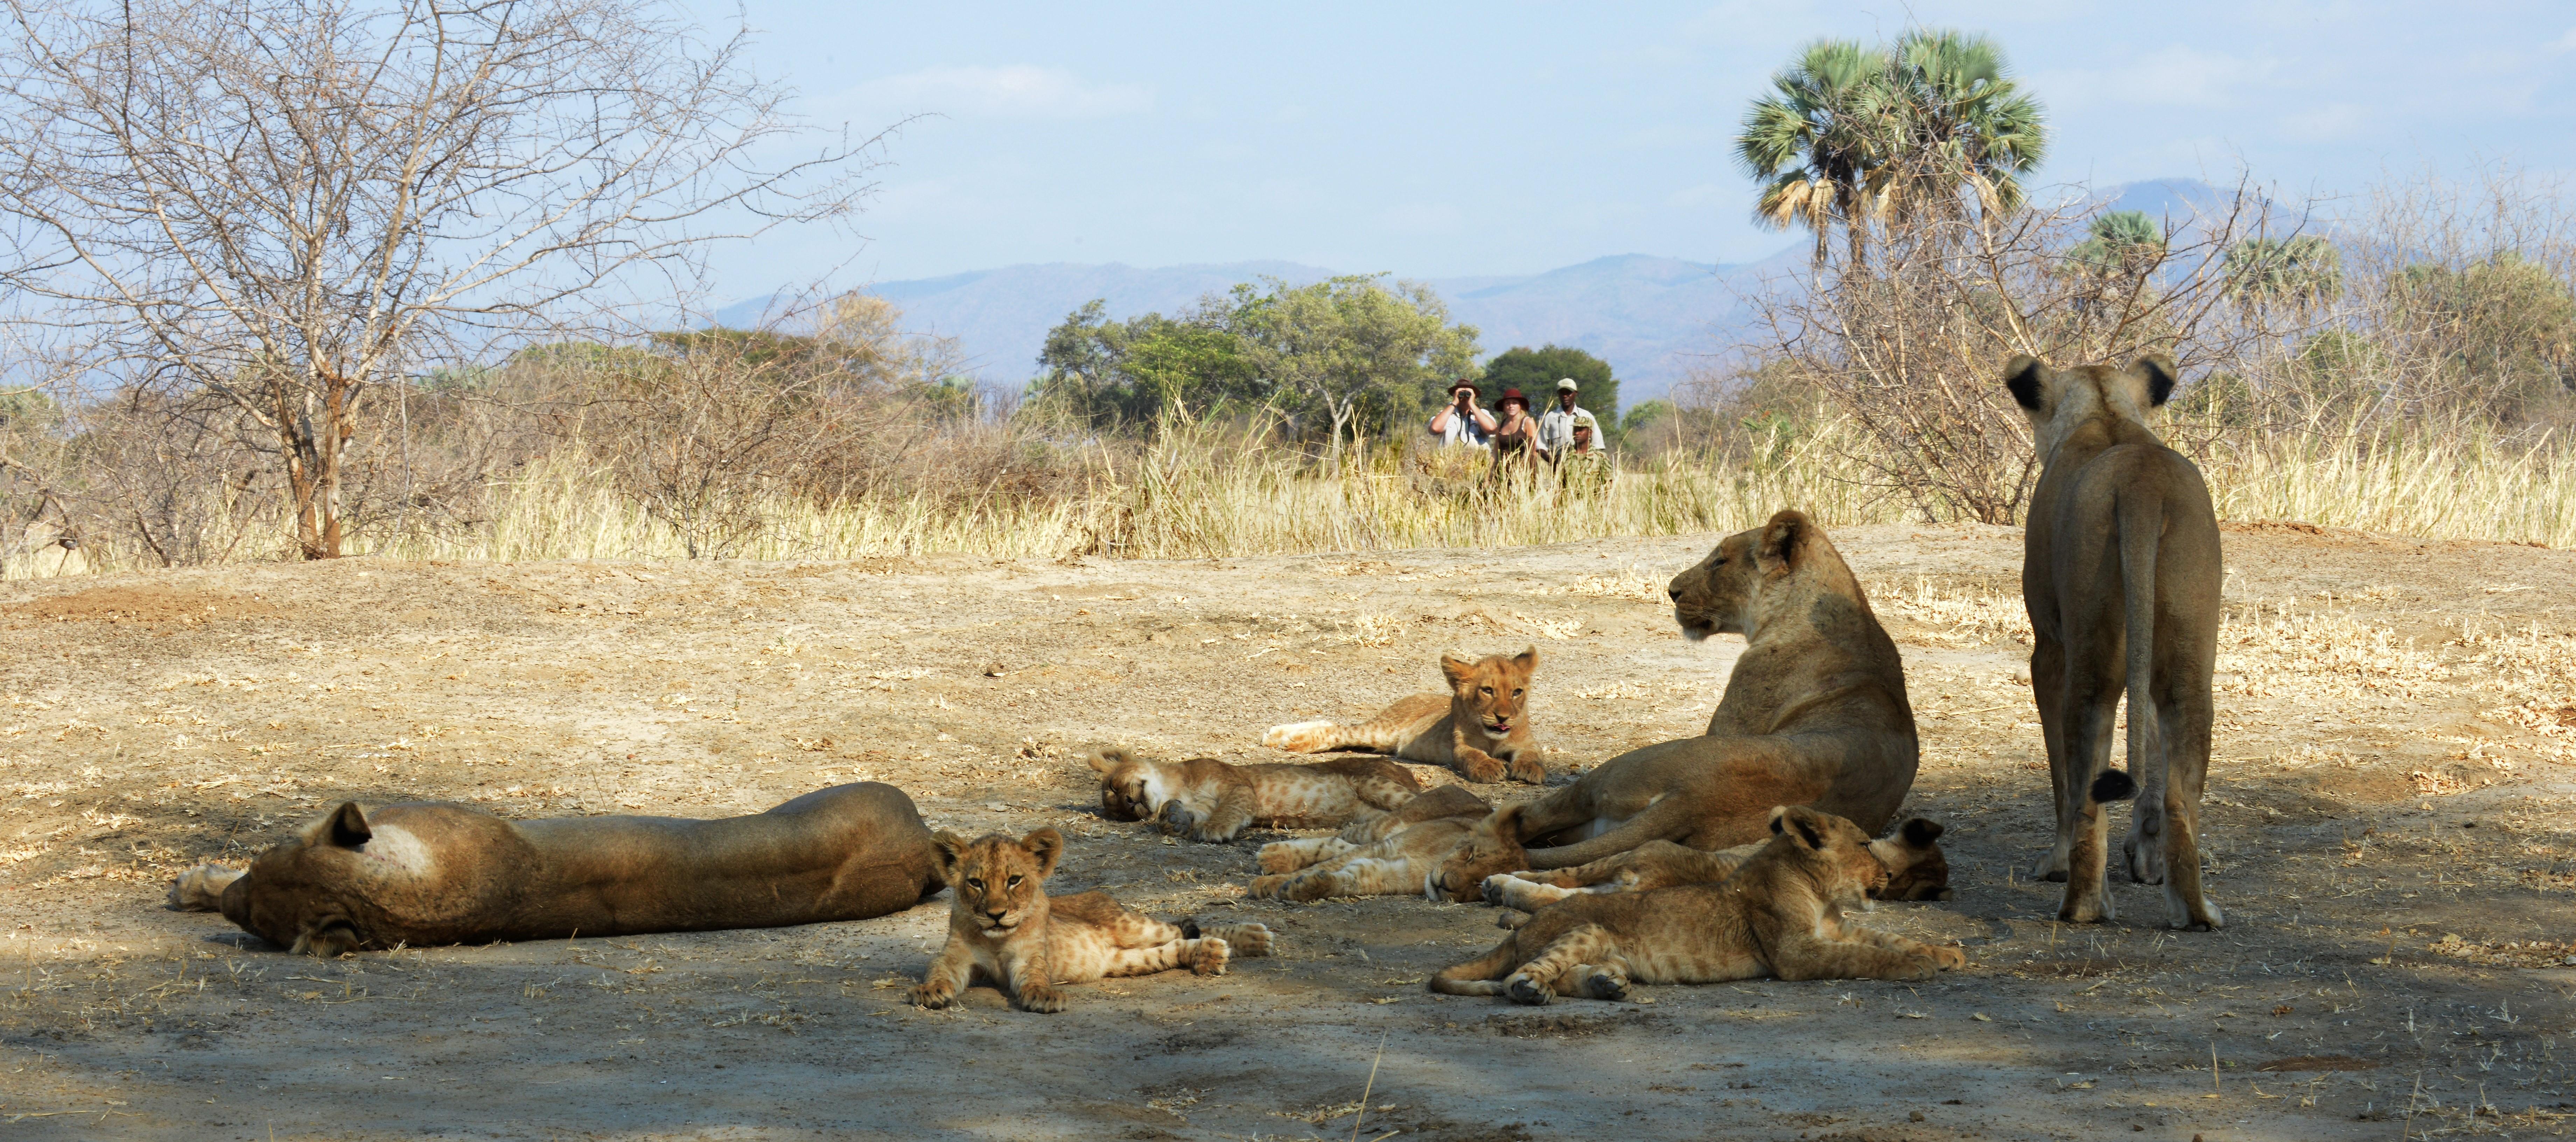 tailor-made-luxury-zambia-safari